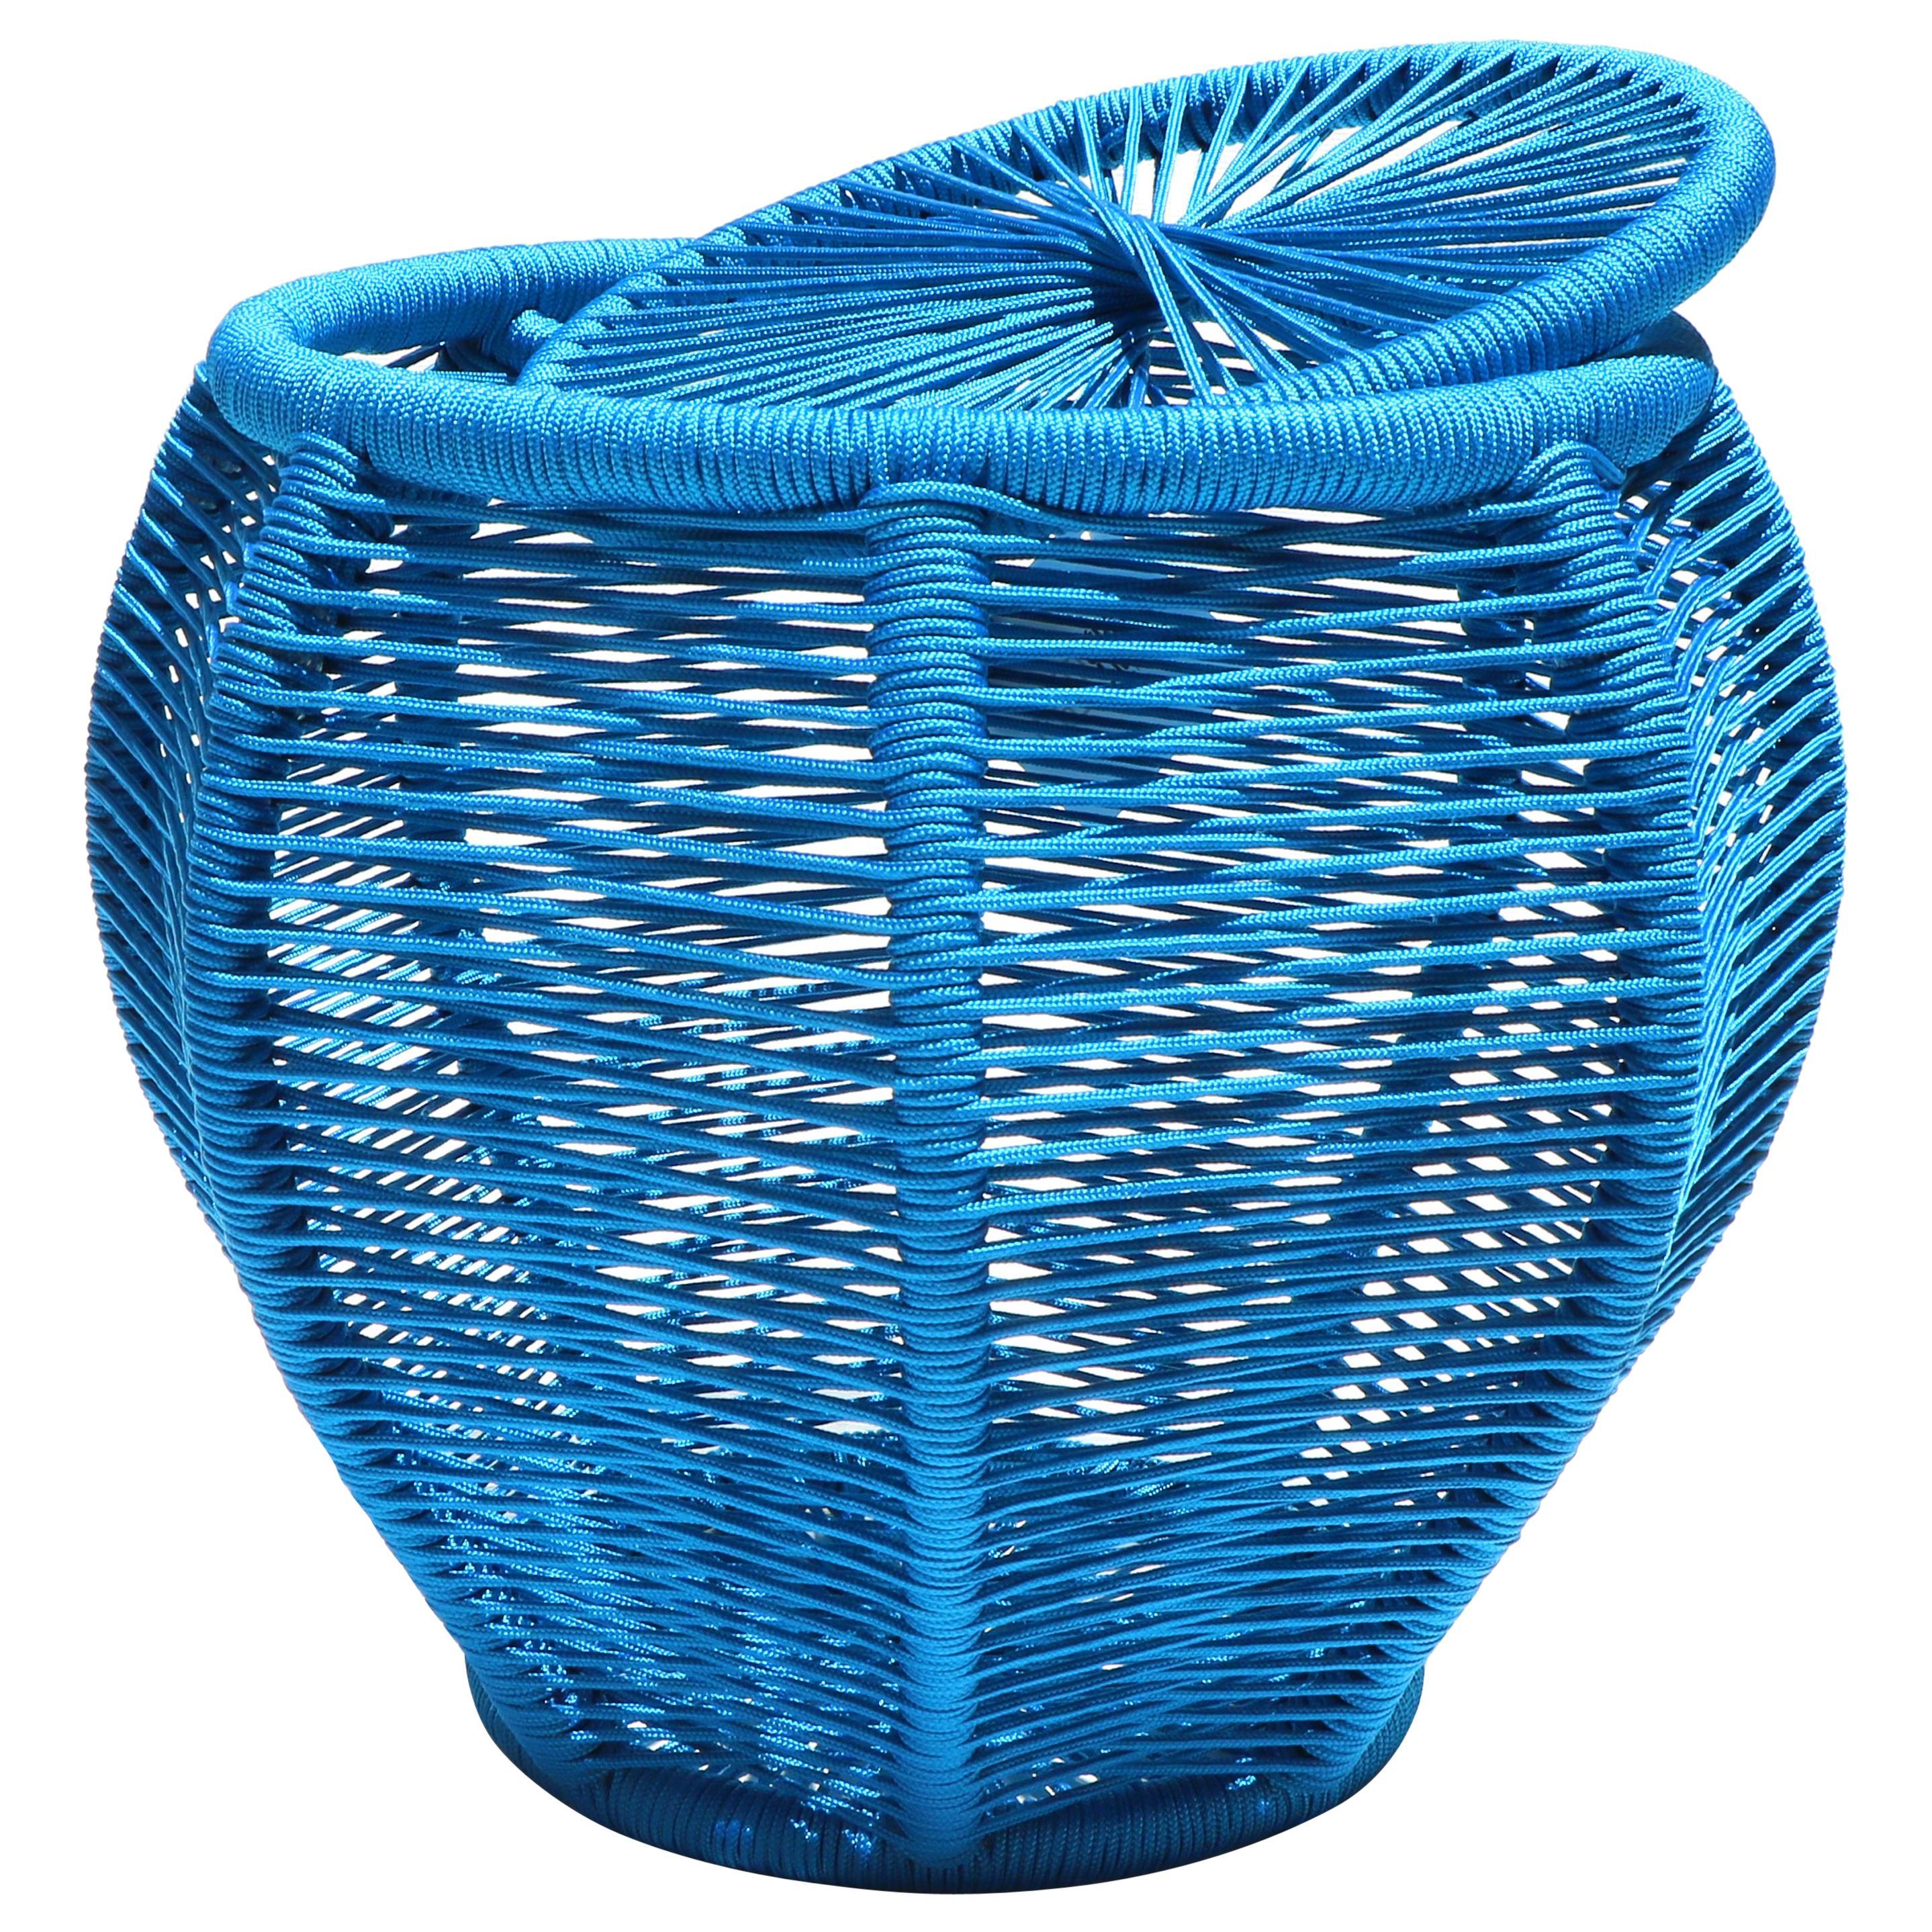 Carambola Basket